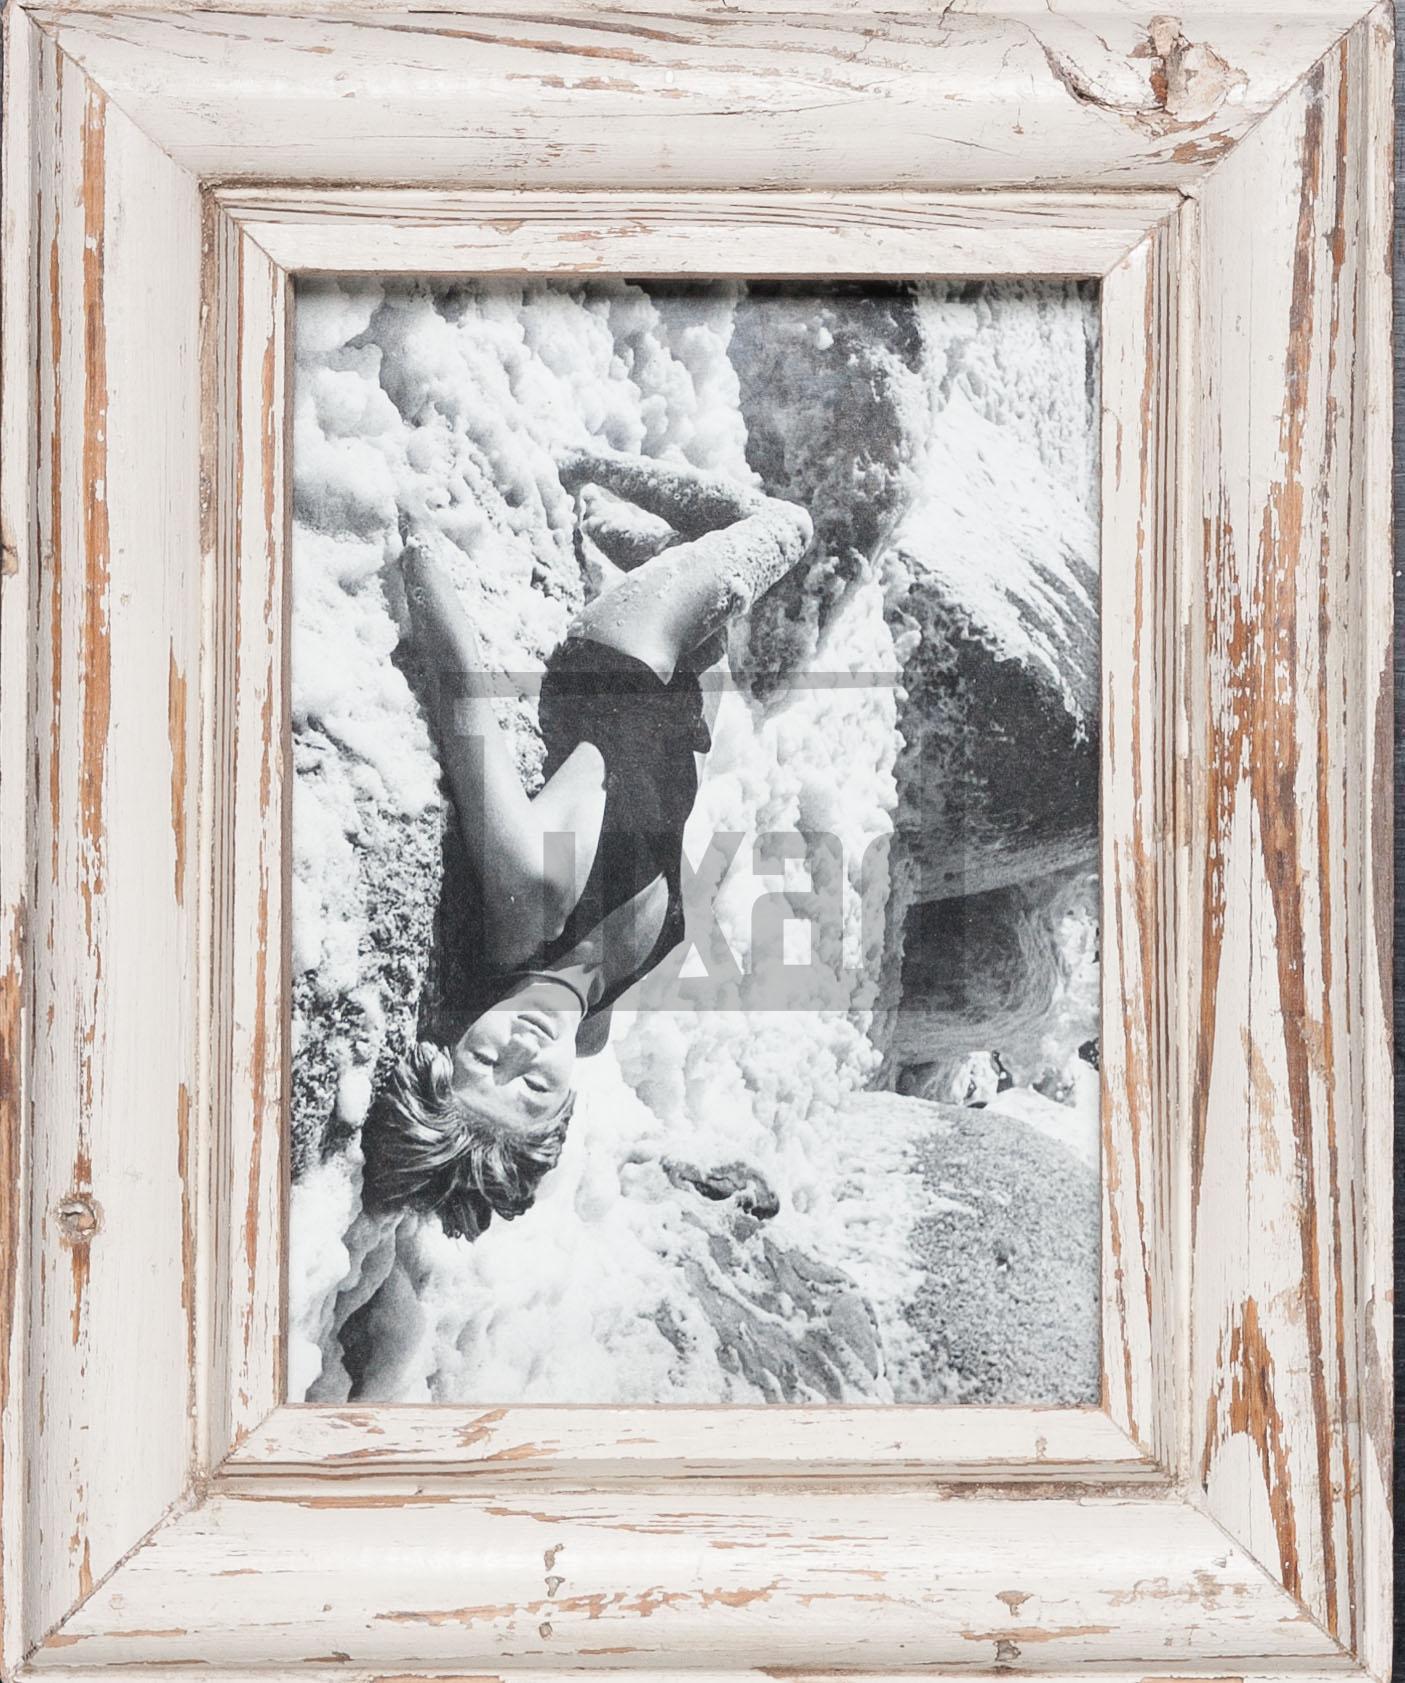 Holzbilderrahmen für Fotos 15 x 20 cm